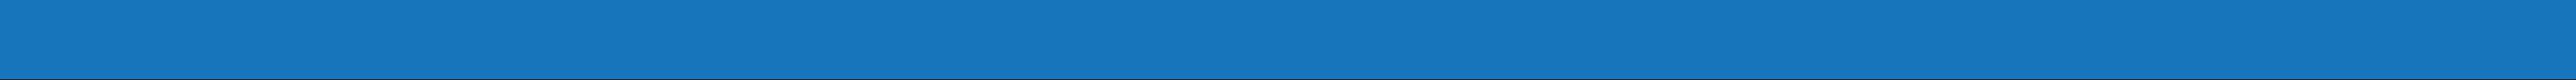 ellipse-bottom-convex-blue